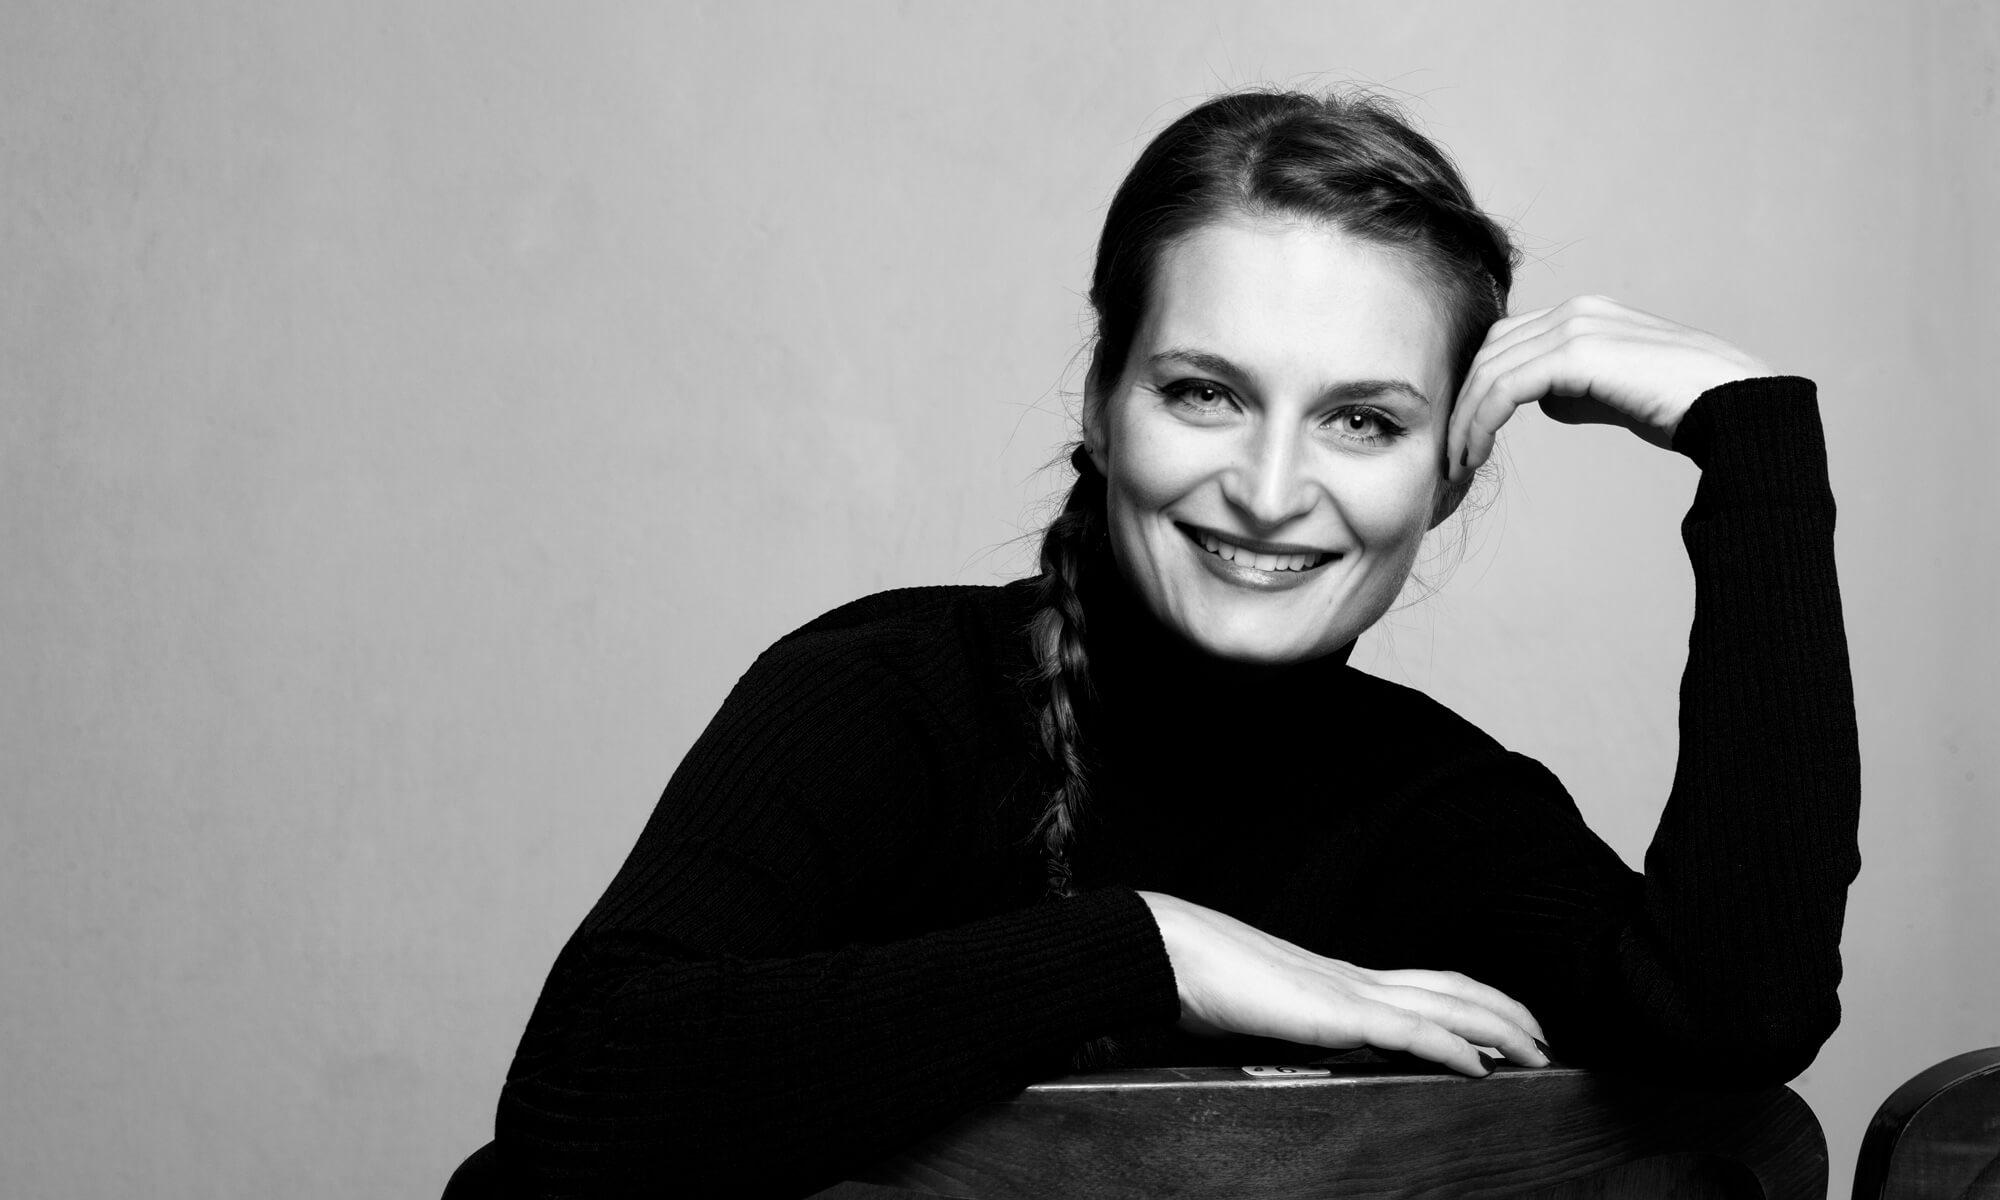 Ursula Anna Baumgartner